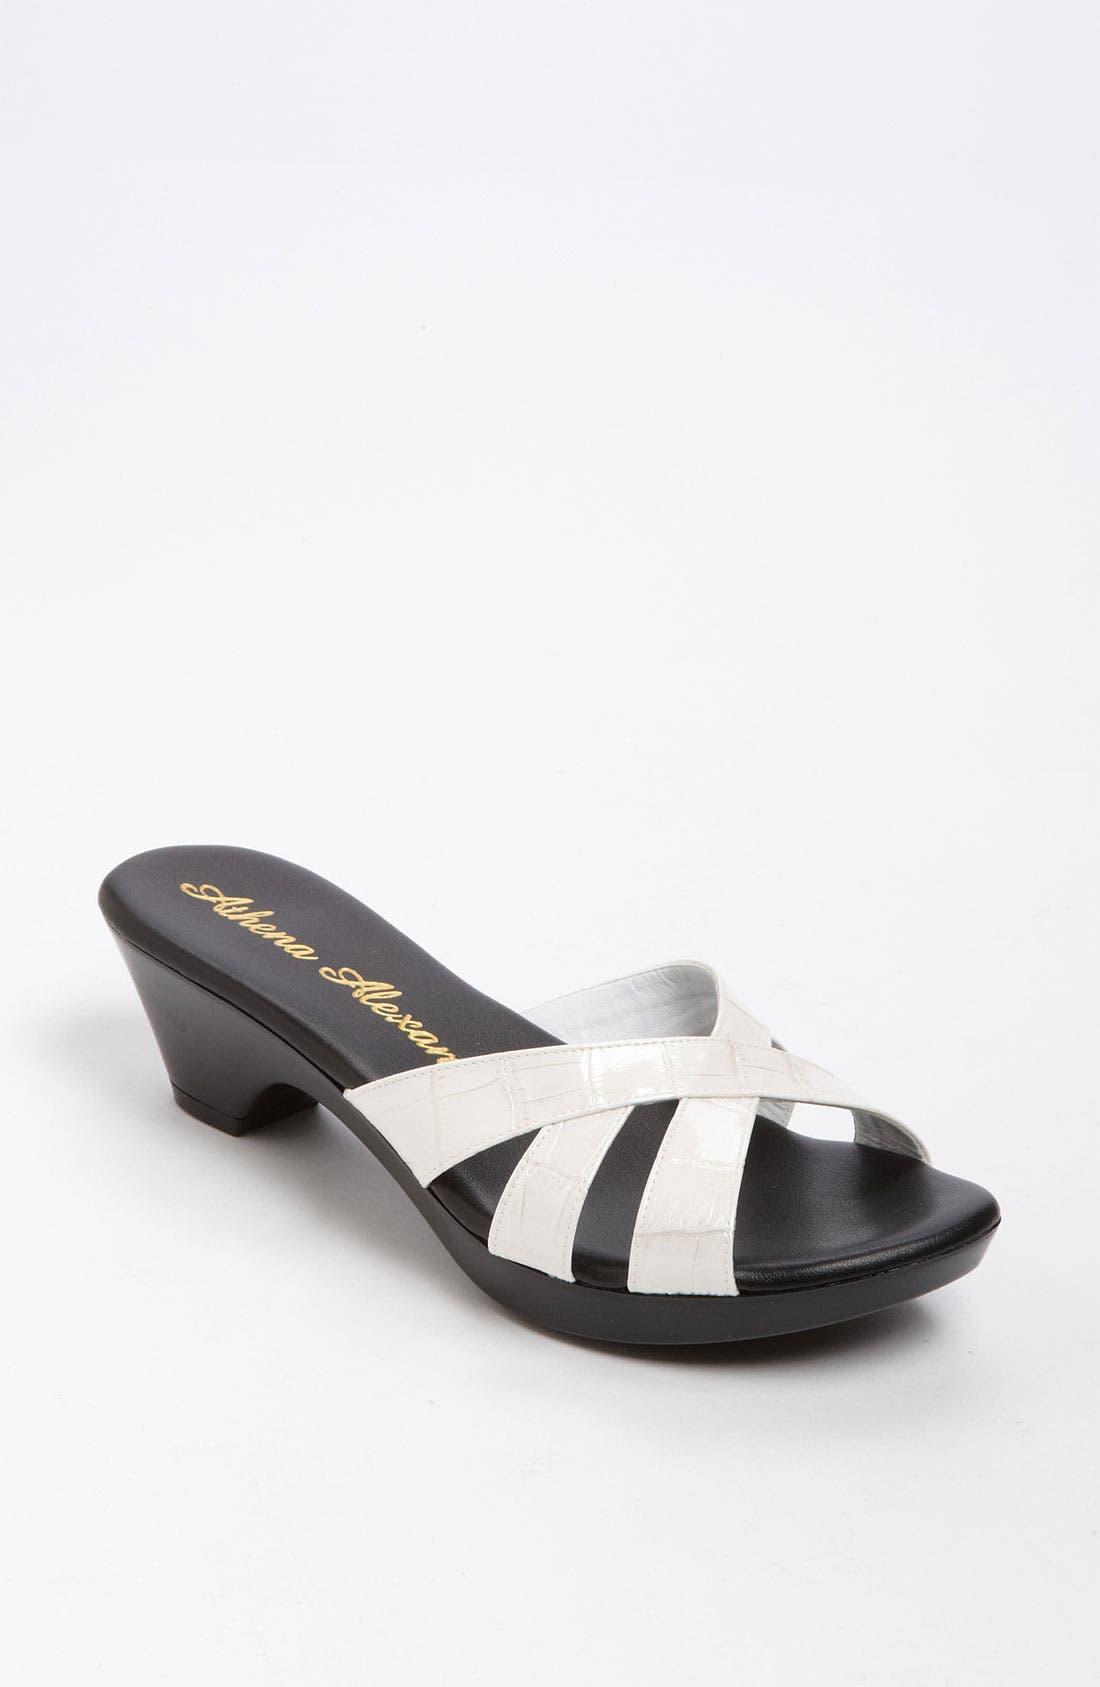 Alternate Image 1 Selected - Athena Alexander 'Nala' Sandal